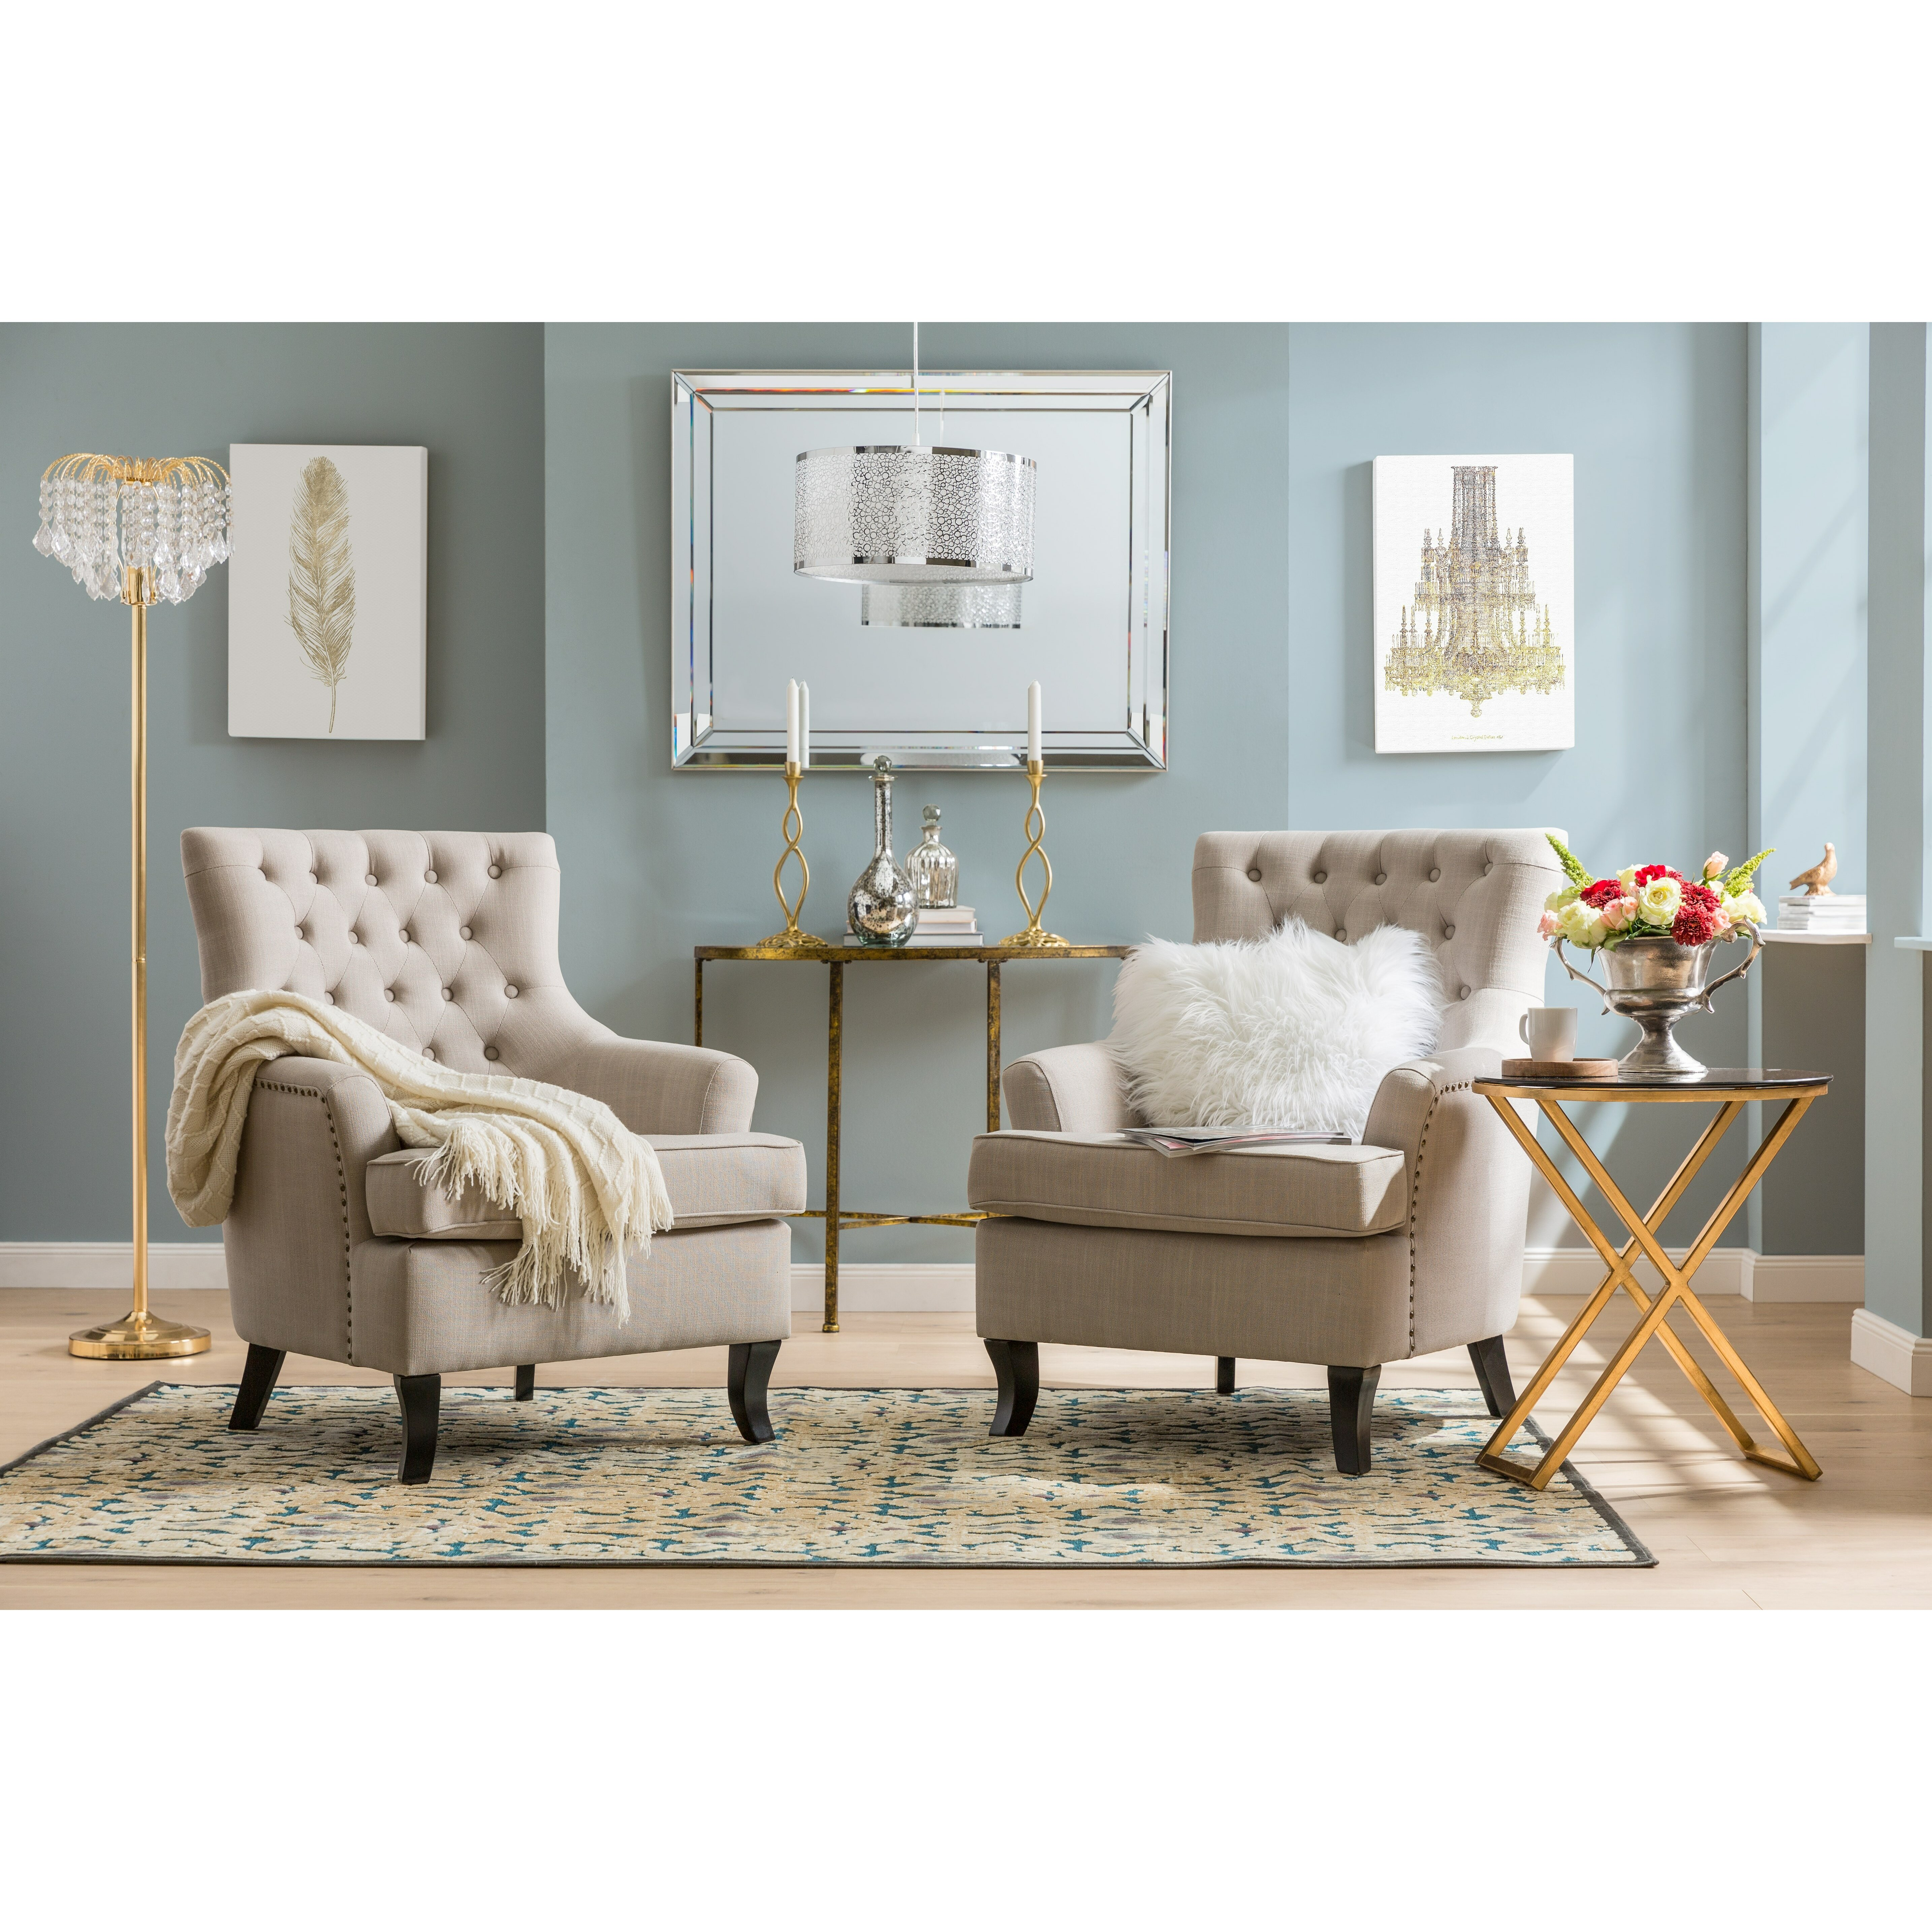 fairmont park trommel pendelleuchte 1 flammig kimberley bewertungen. Black Bedroom Furniture Sets. Home Design Ideas